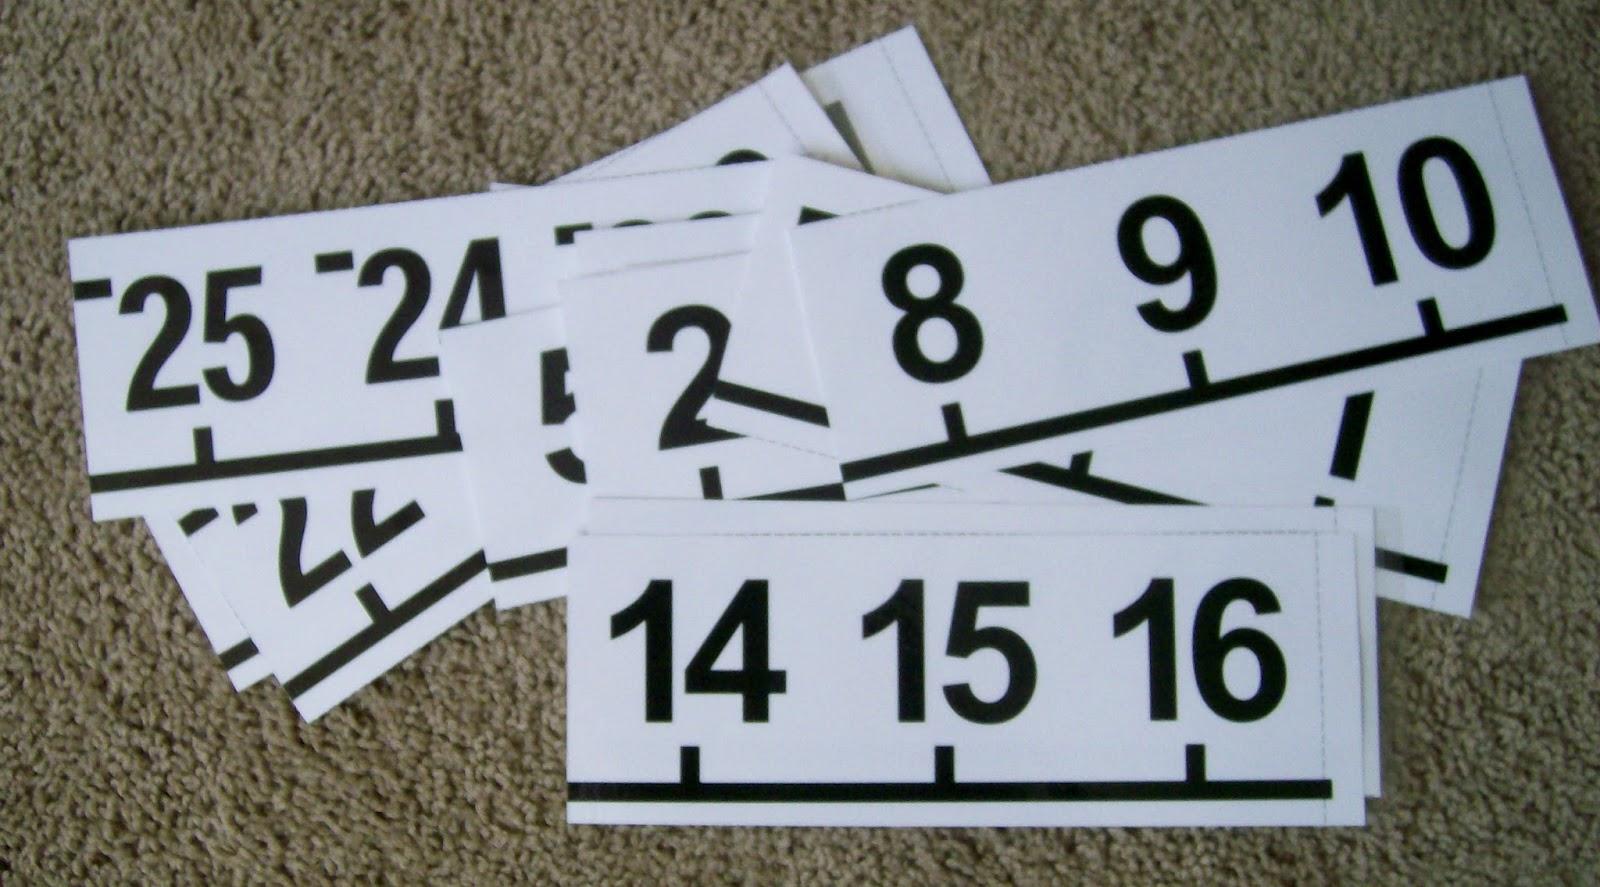 ... Printable Number Line 1-10, Large Printable Number Line and Free